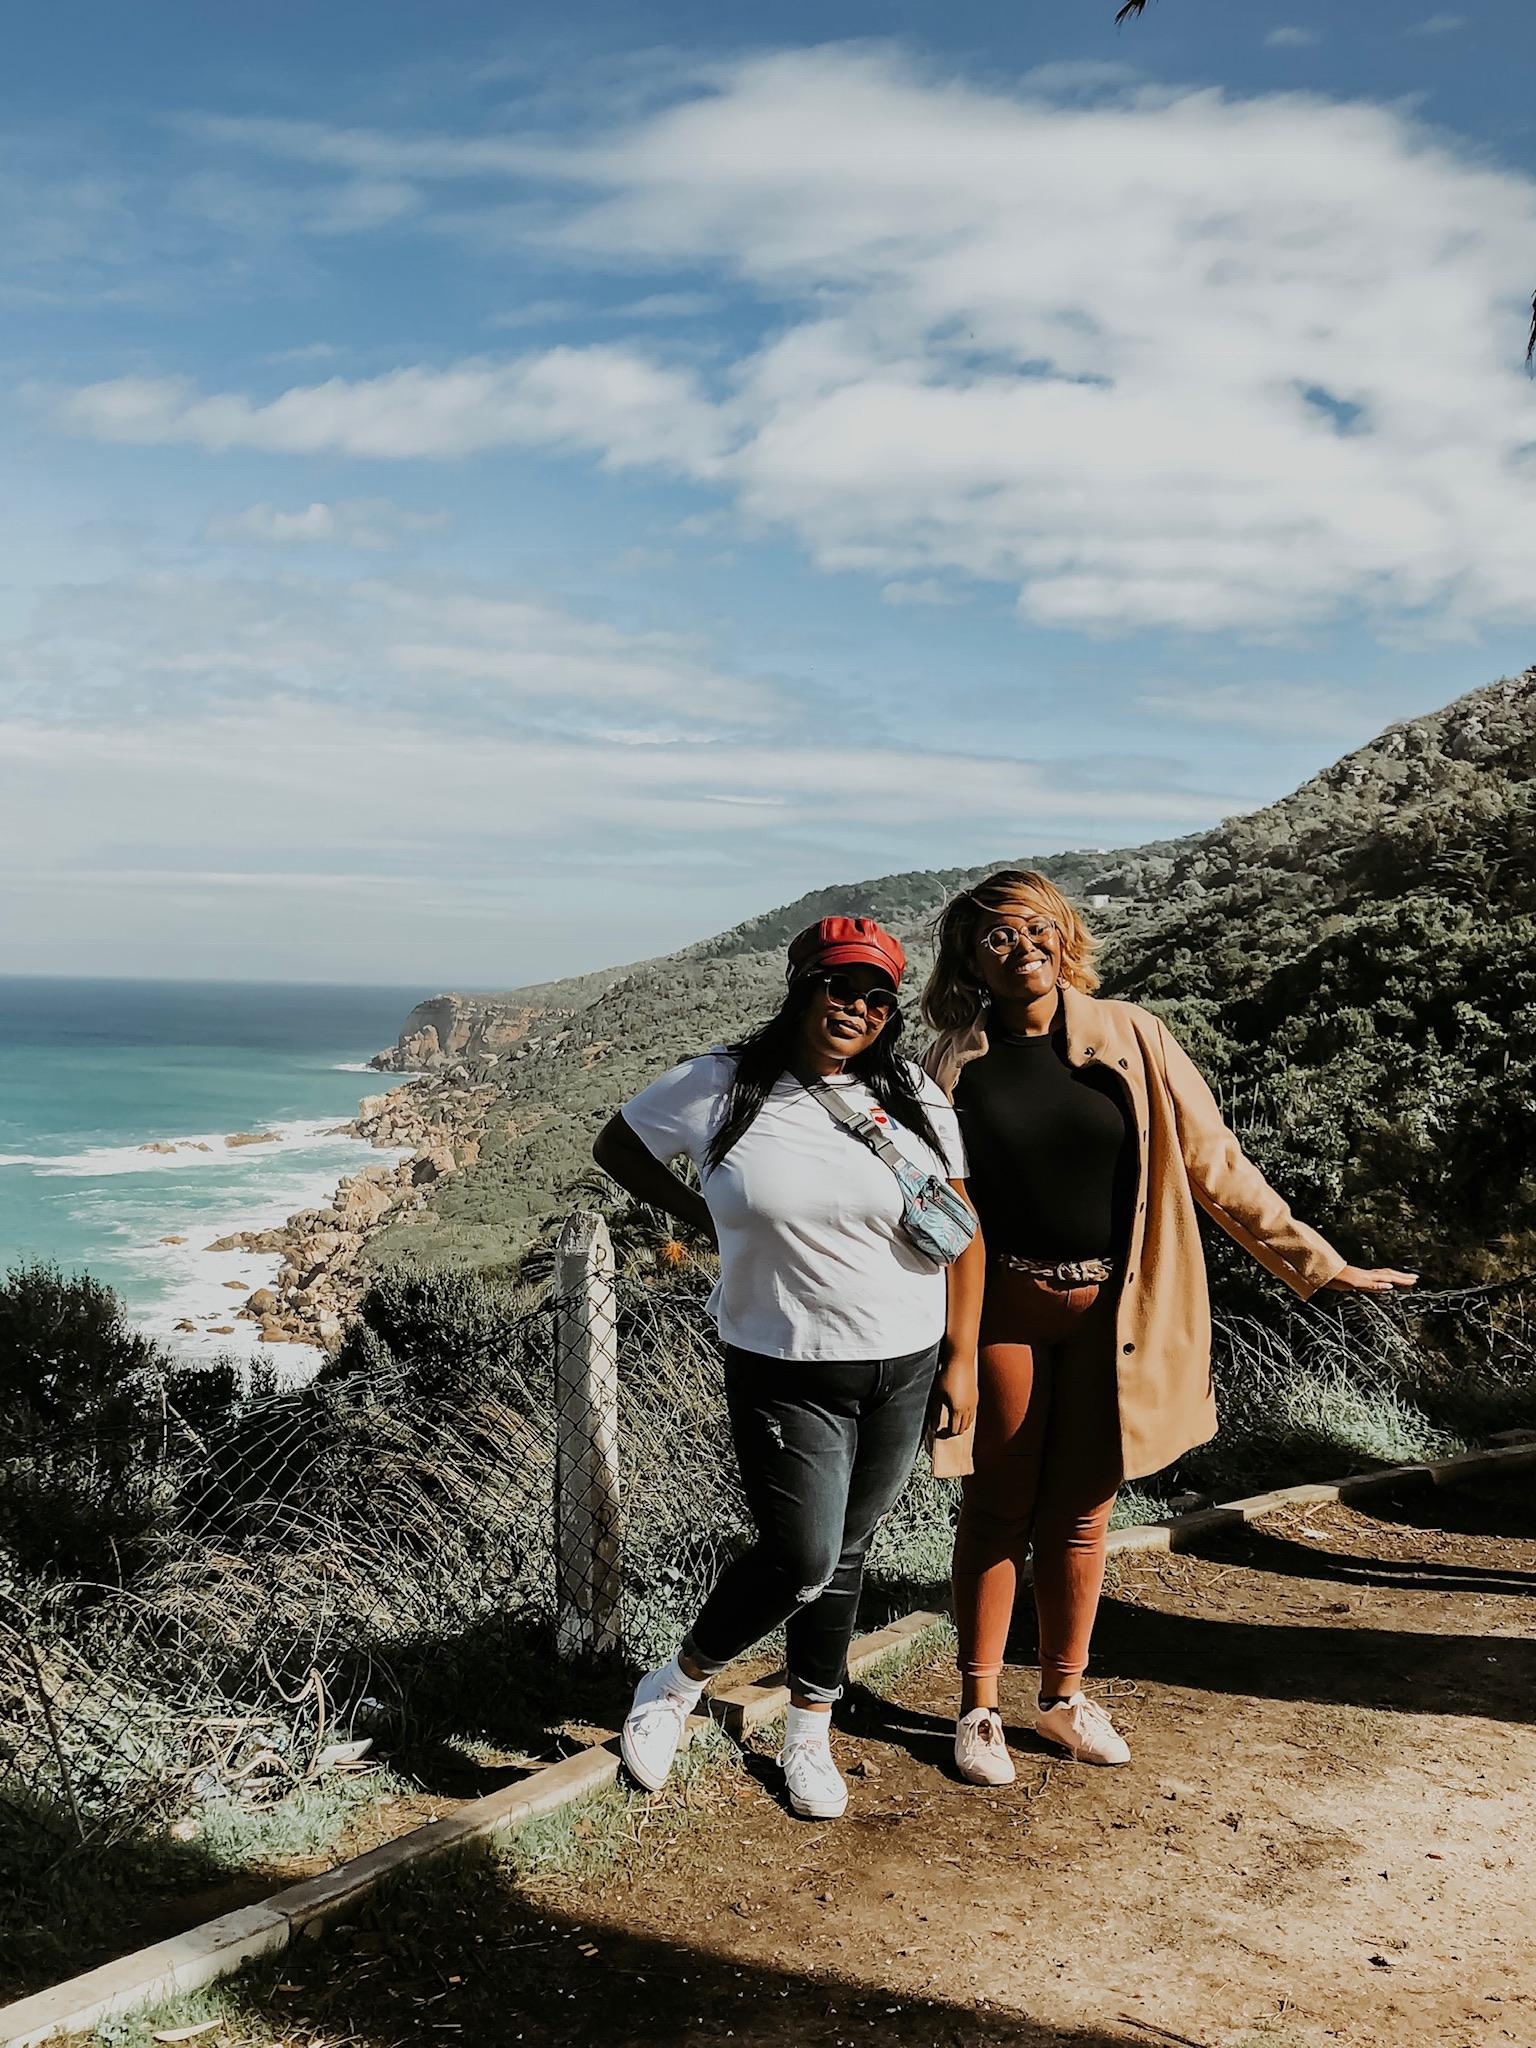 This is where the Mediterranean and Atlantic seas meet!!